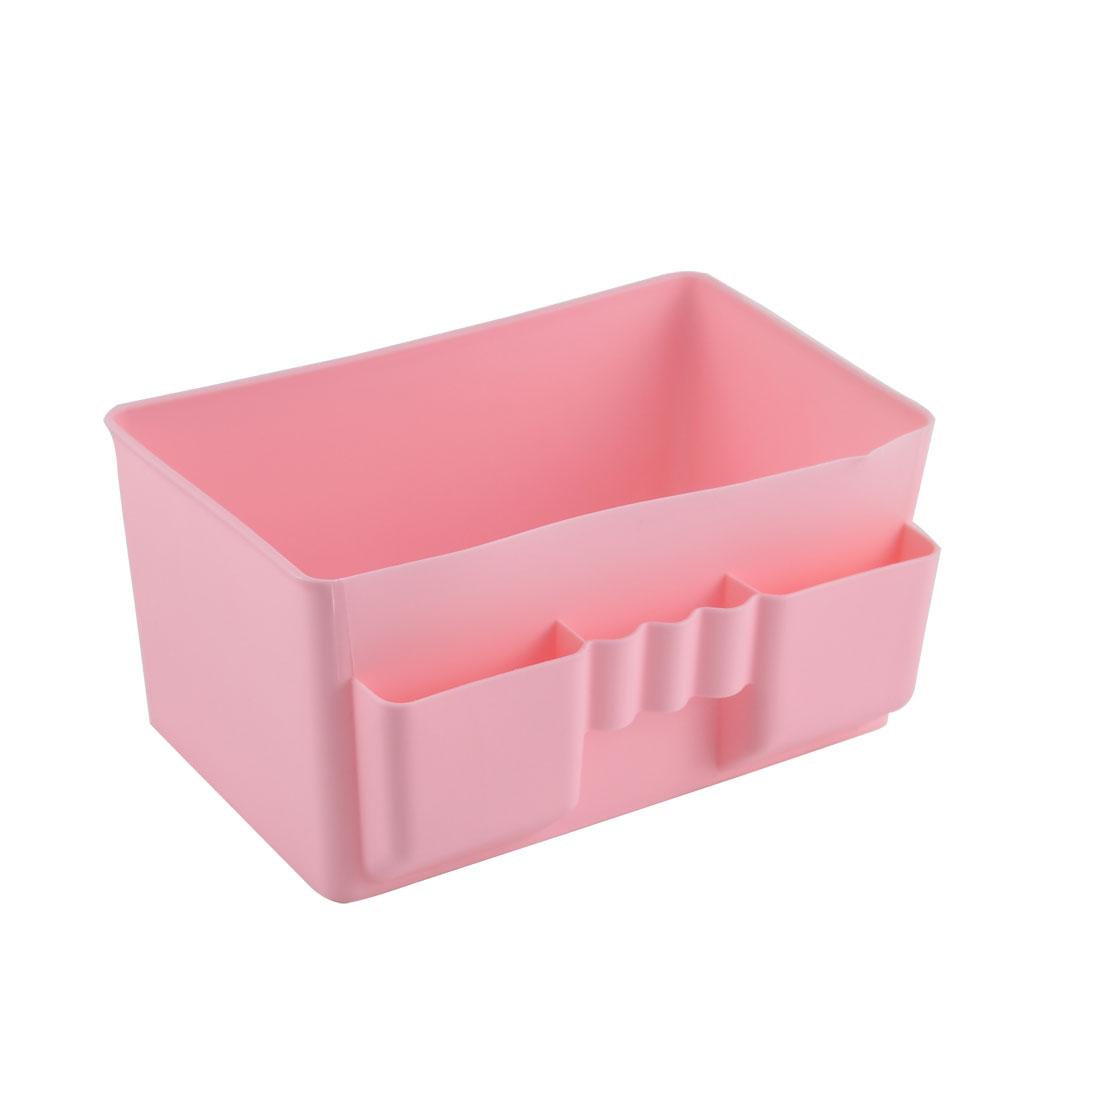 Home Washroom Desktop Plastic Cosmetic Toothpaste Storage Box Organizer Pink